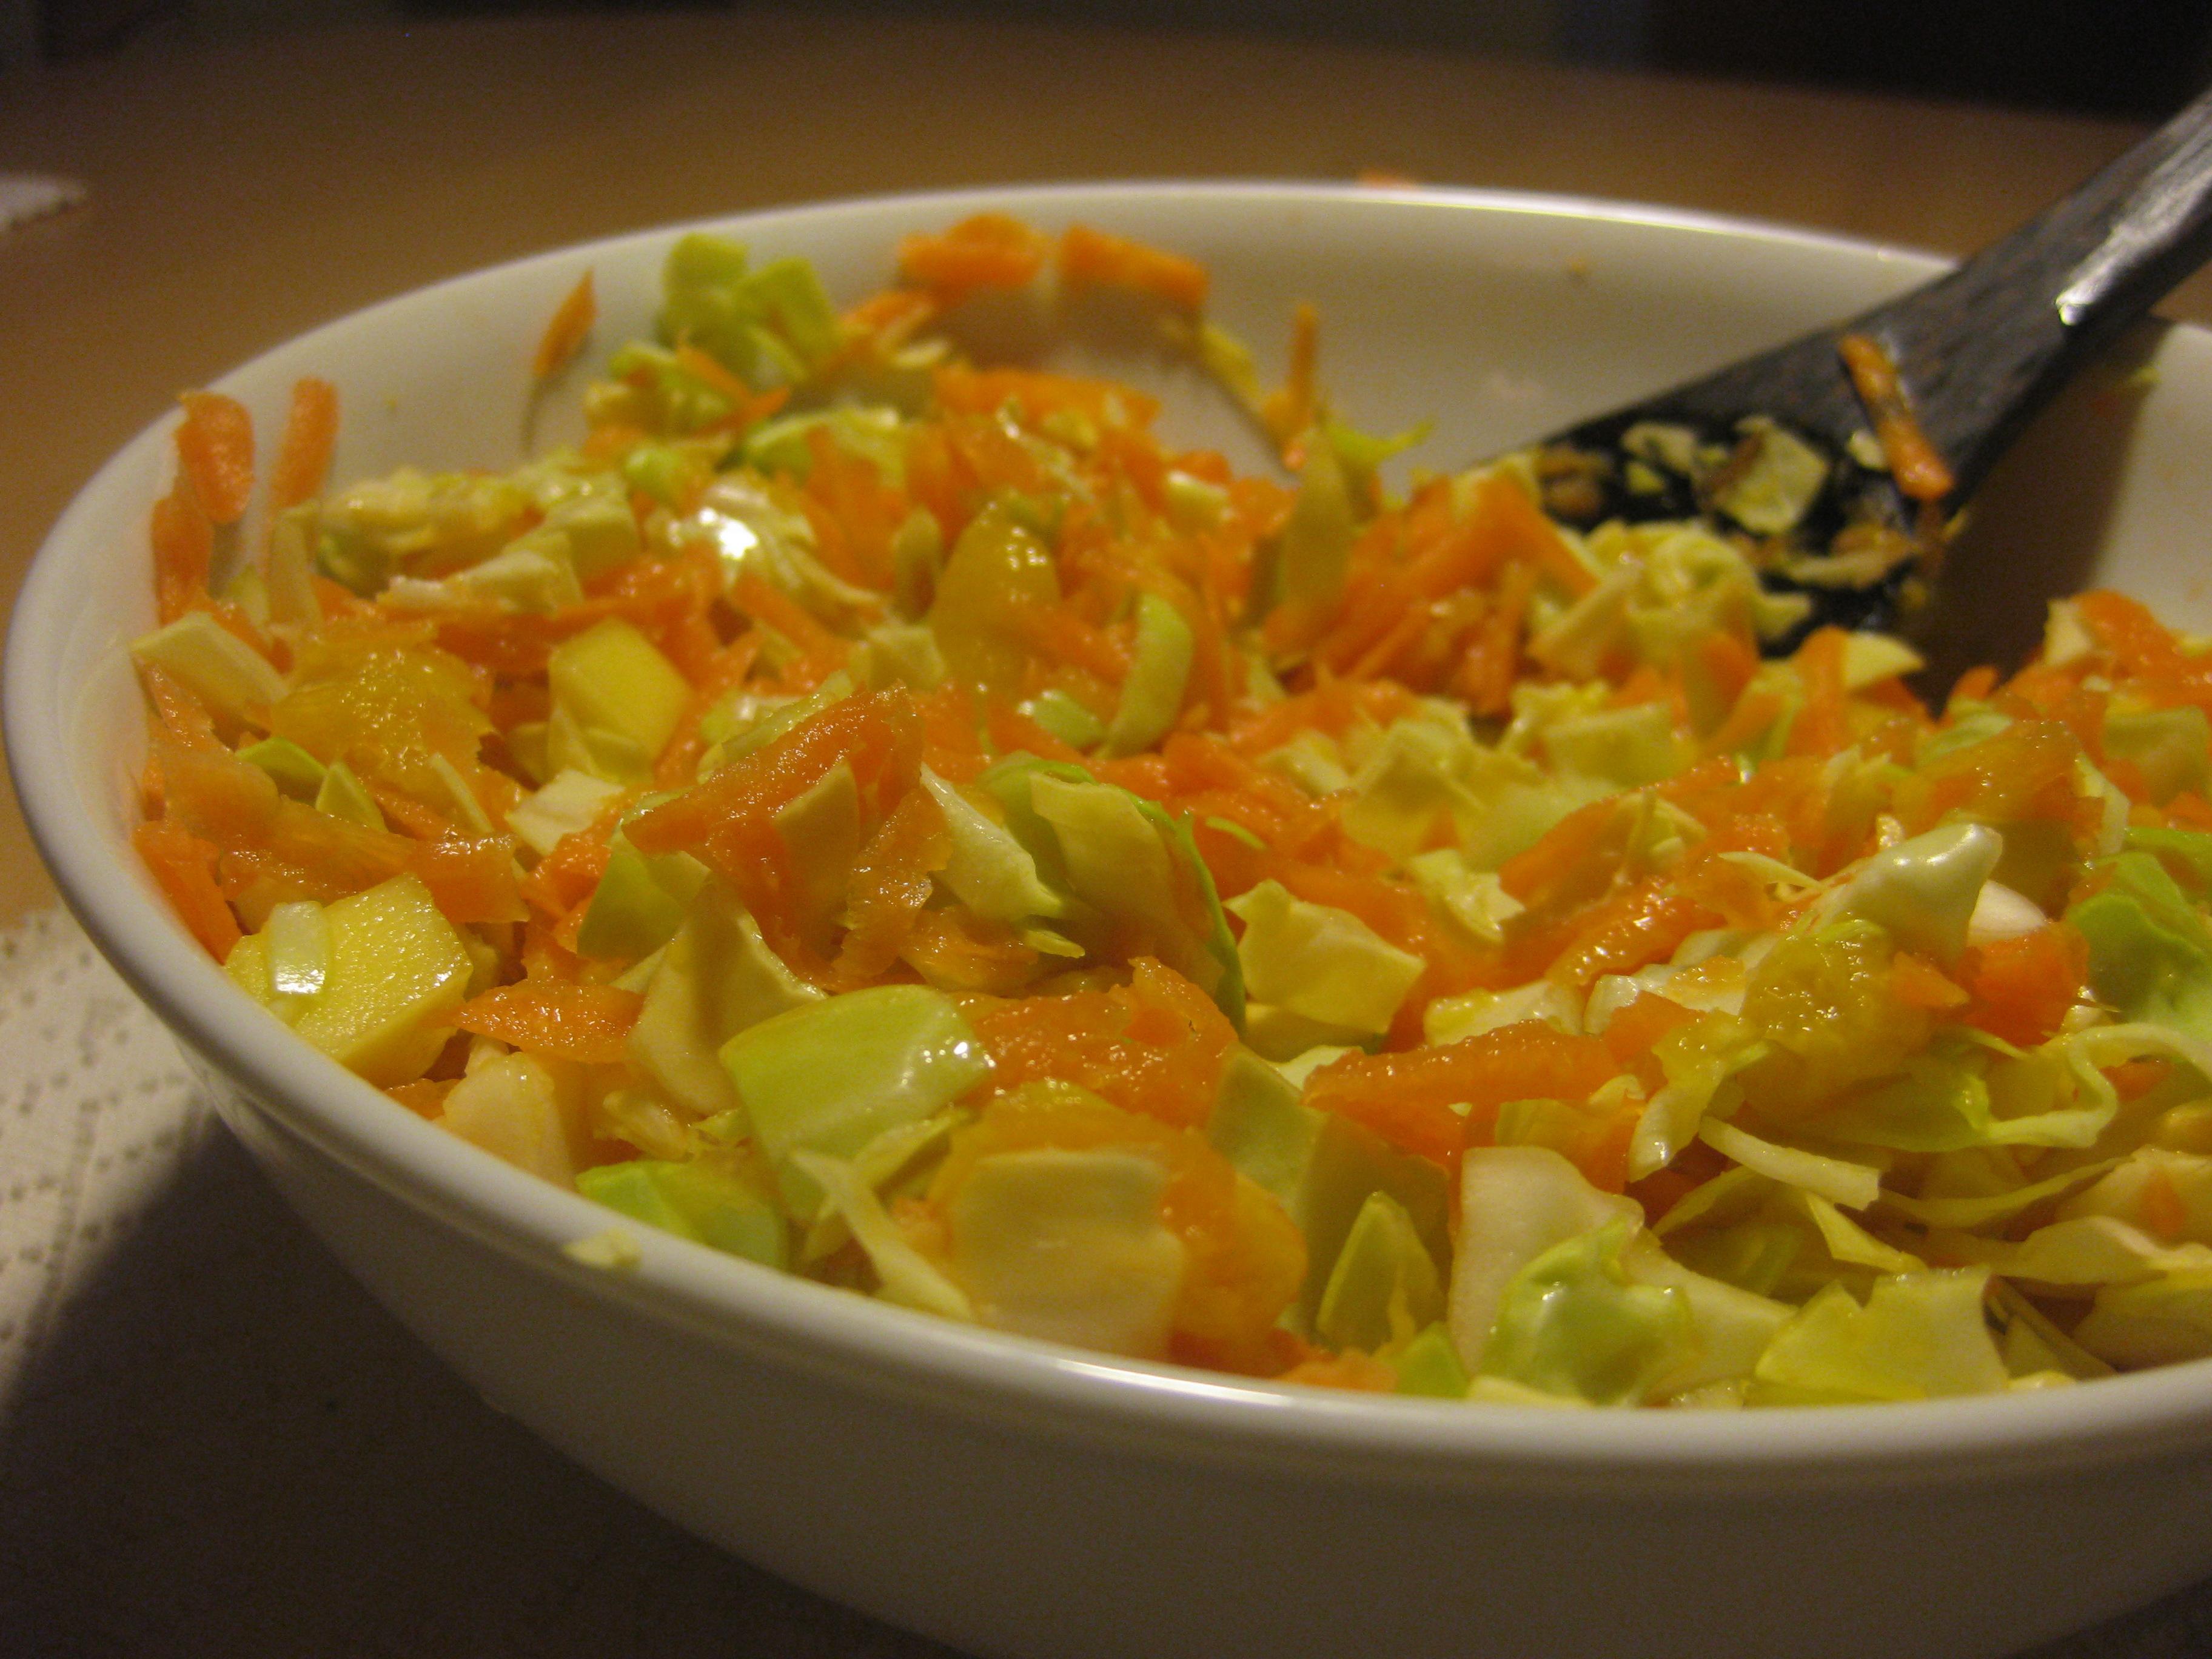 Slaw med gulerødder, spidskål og mango